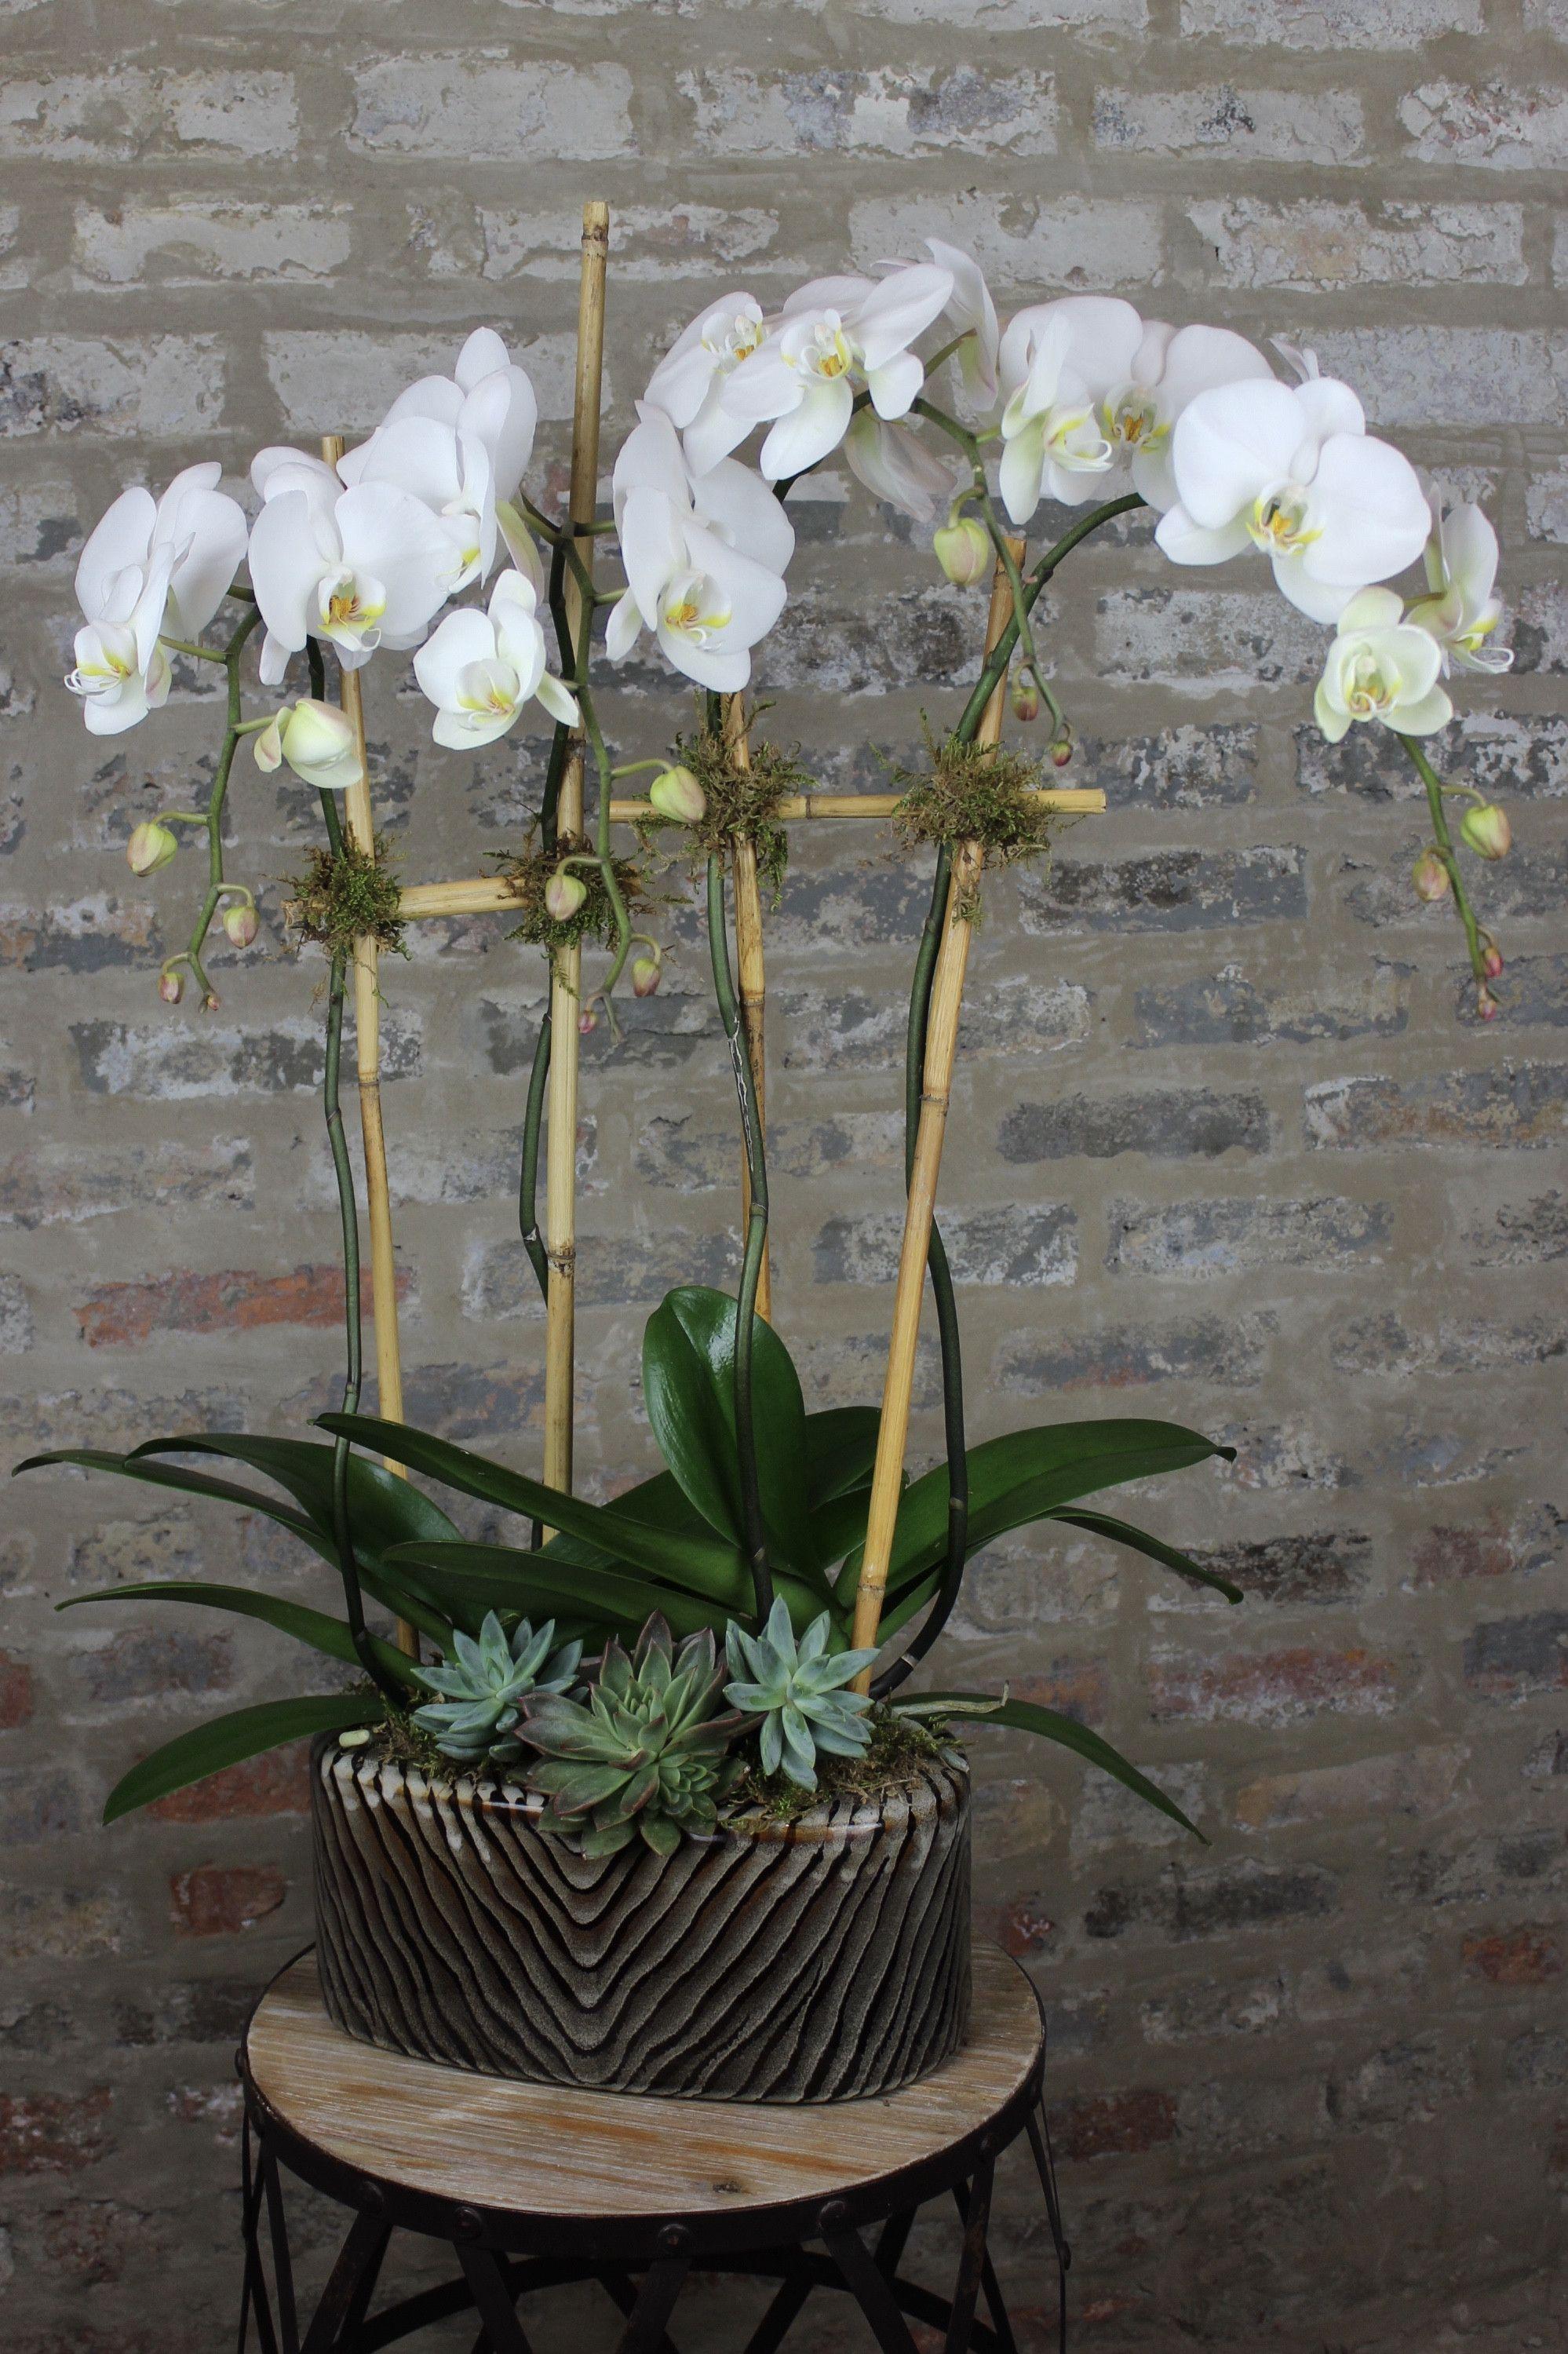 Oak Street Orchids Flower Delivery Orchid Plants Orchids